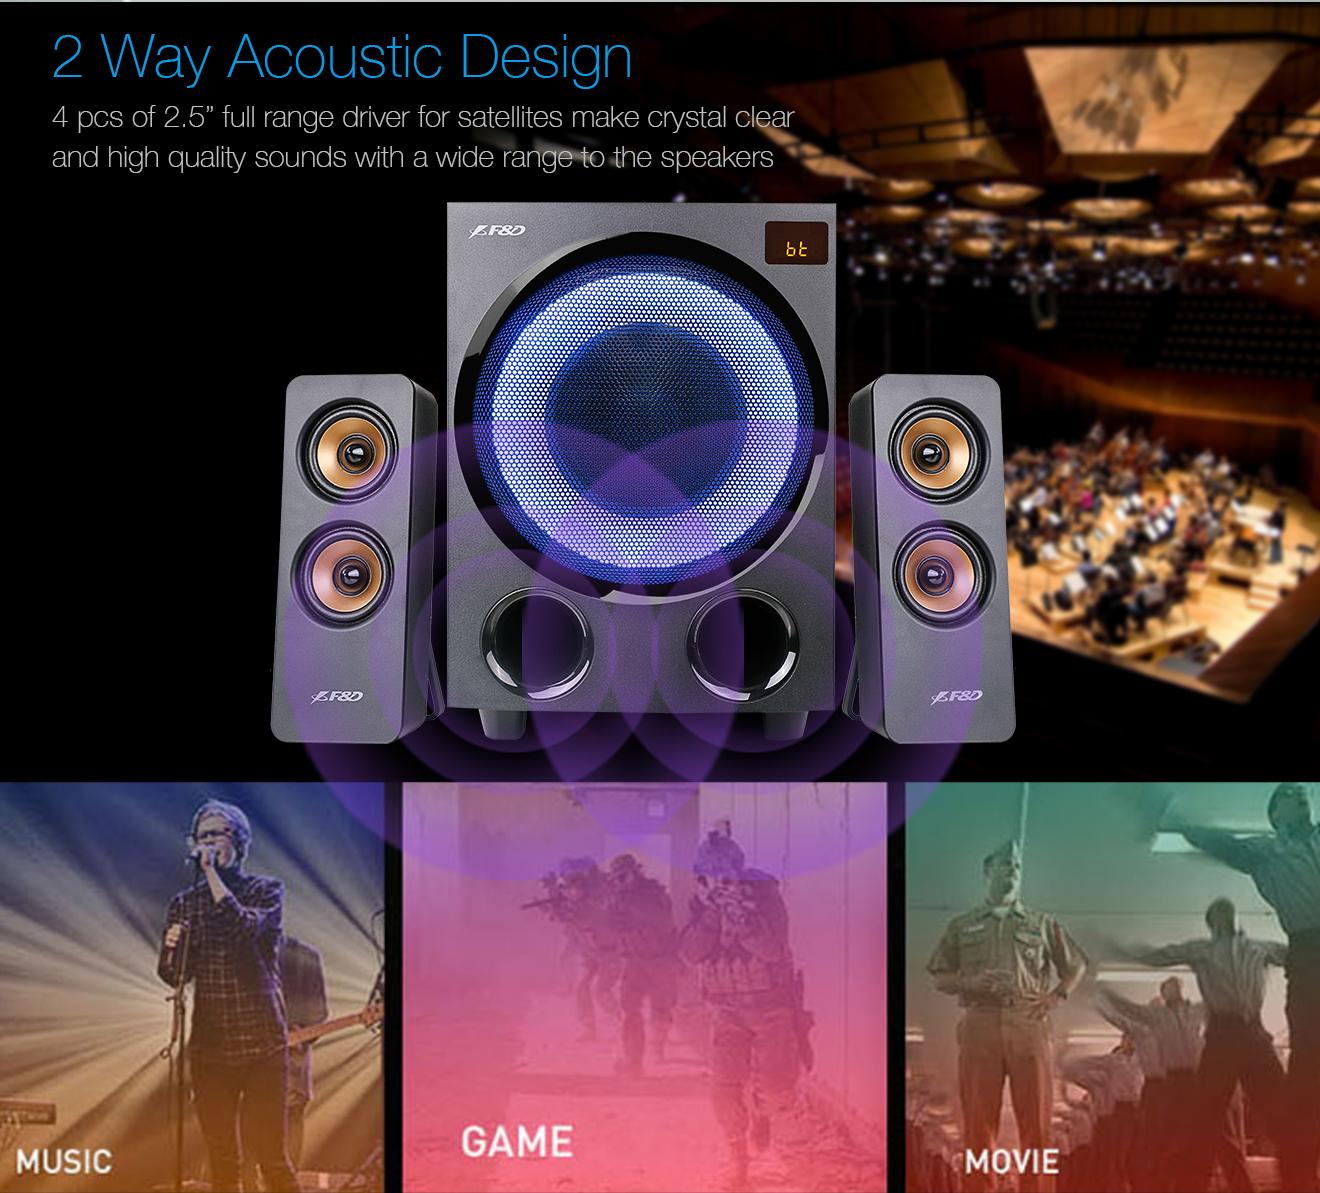 2 Way Acoustic Design